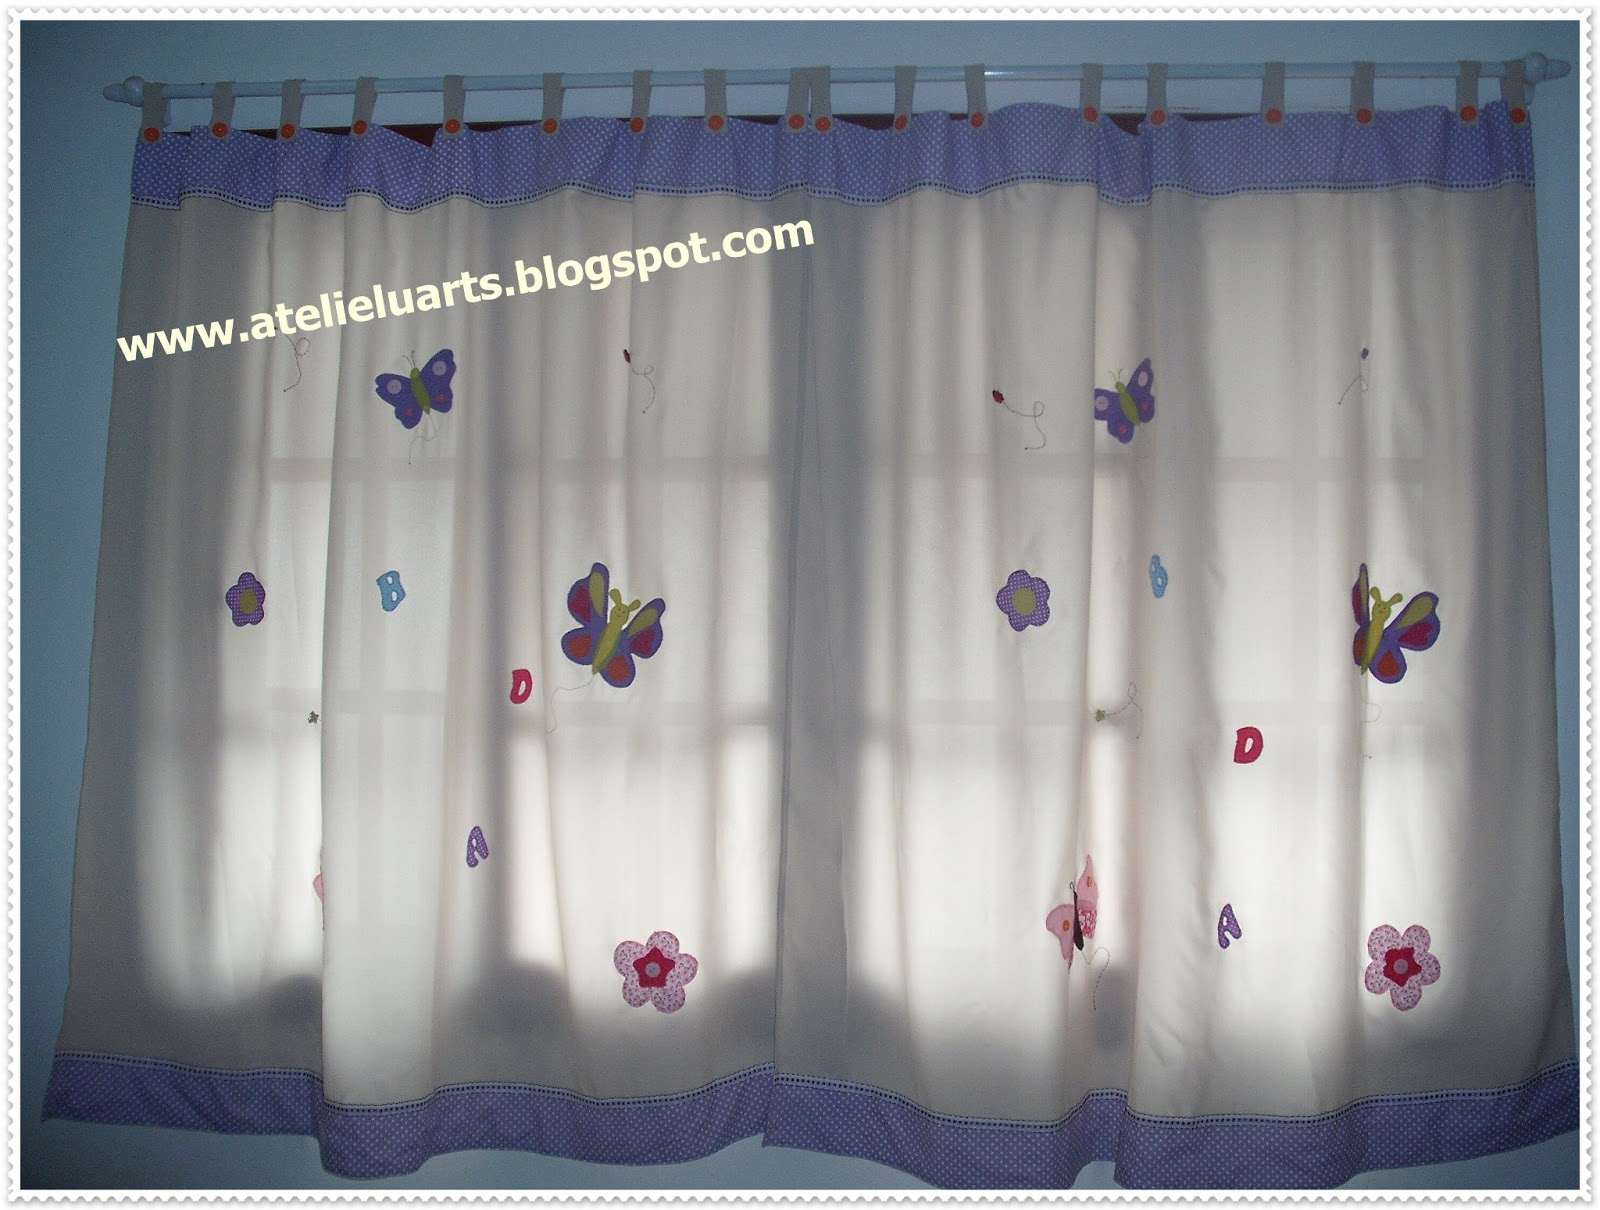 Ateli luarts cortina quarto infantil aplicada for Cortinas para aulas